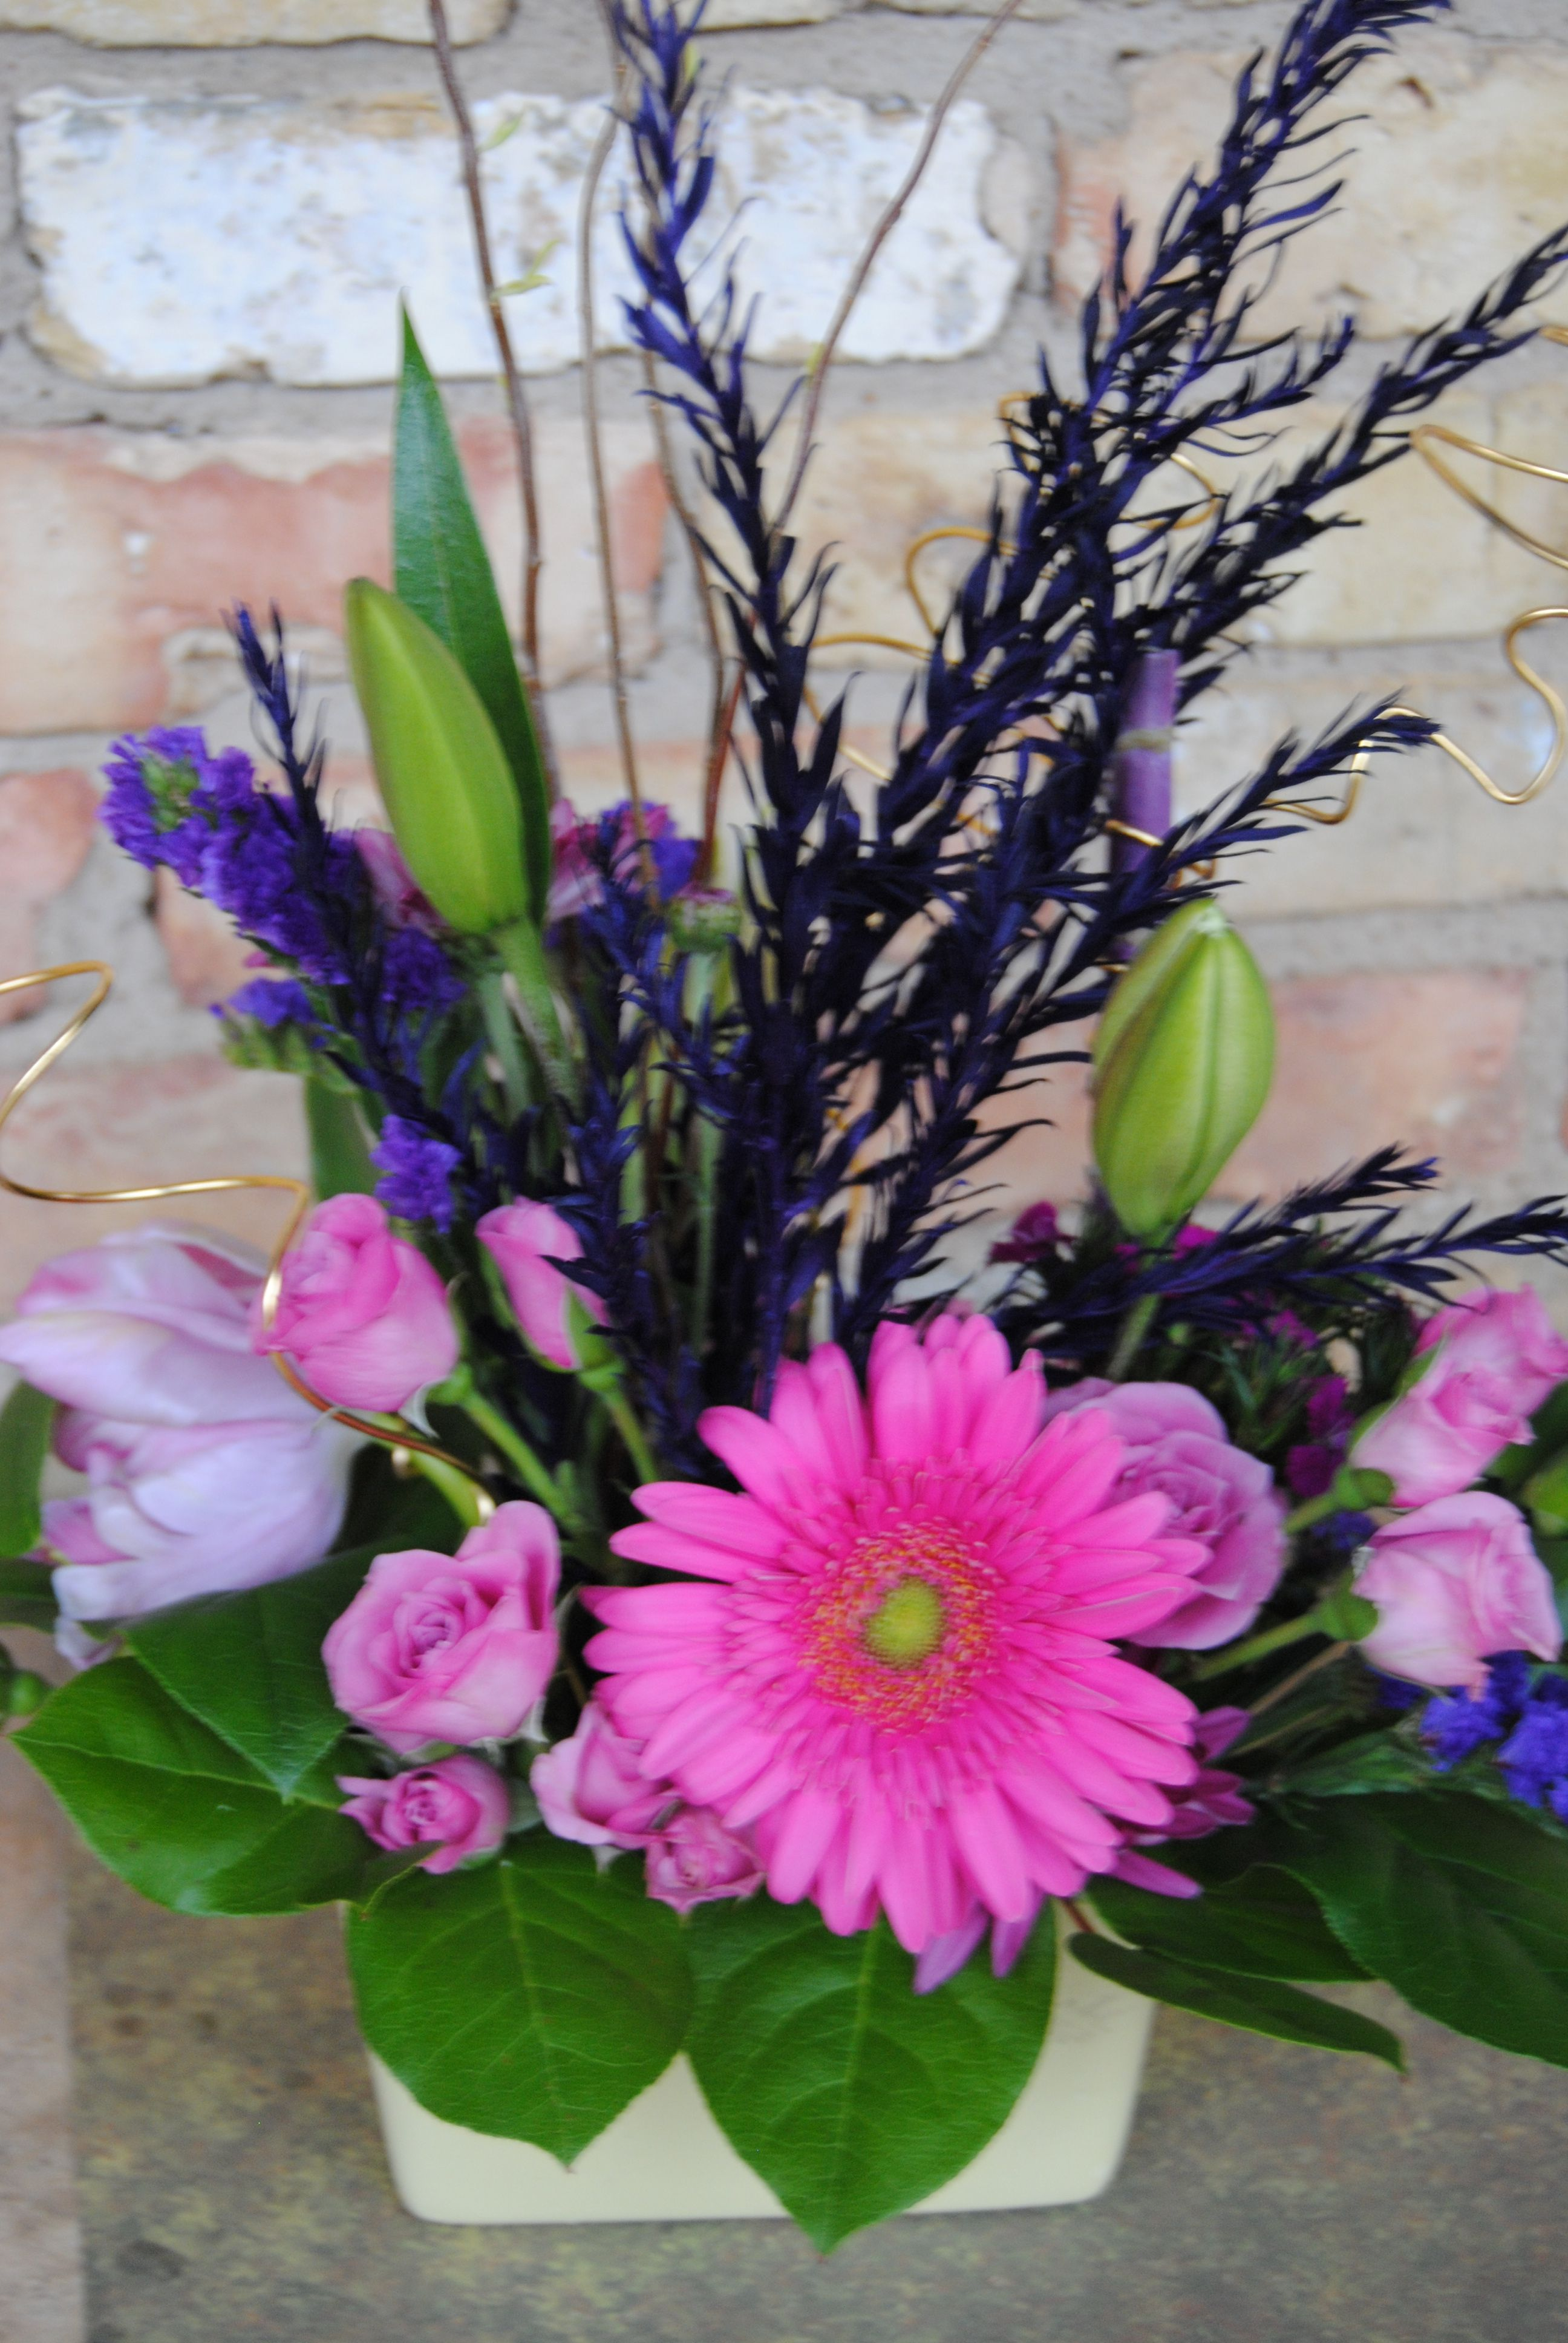 Purple Flowers Pink Gerber Daisy Small Spring Floral Arrangement